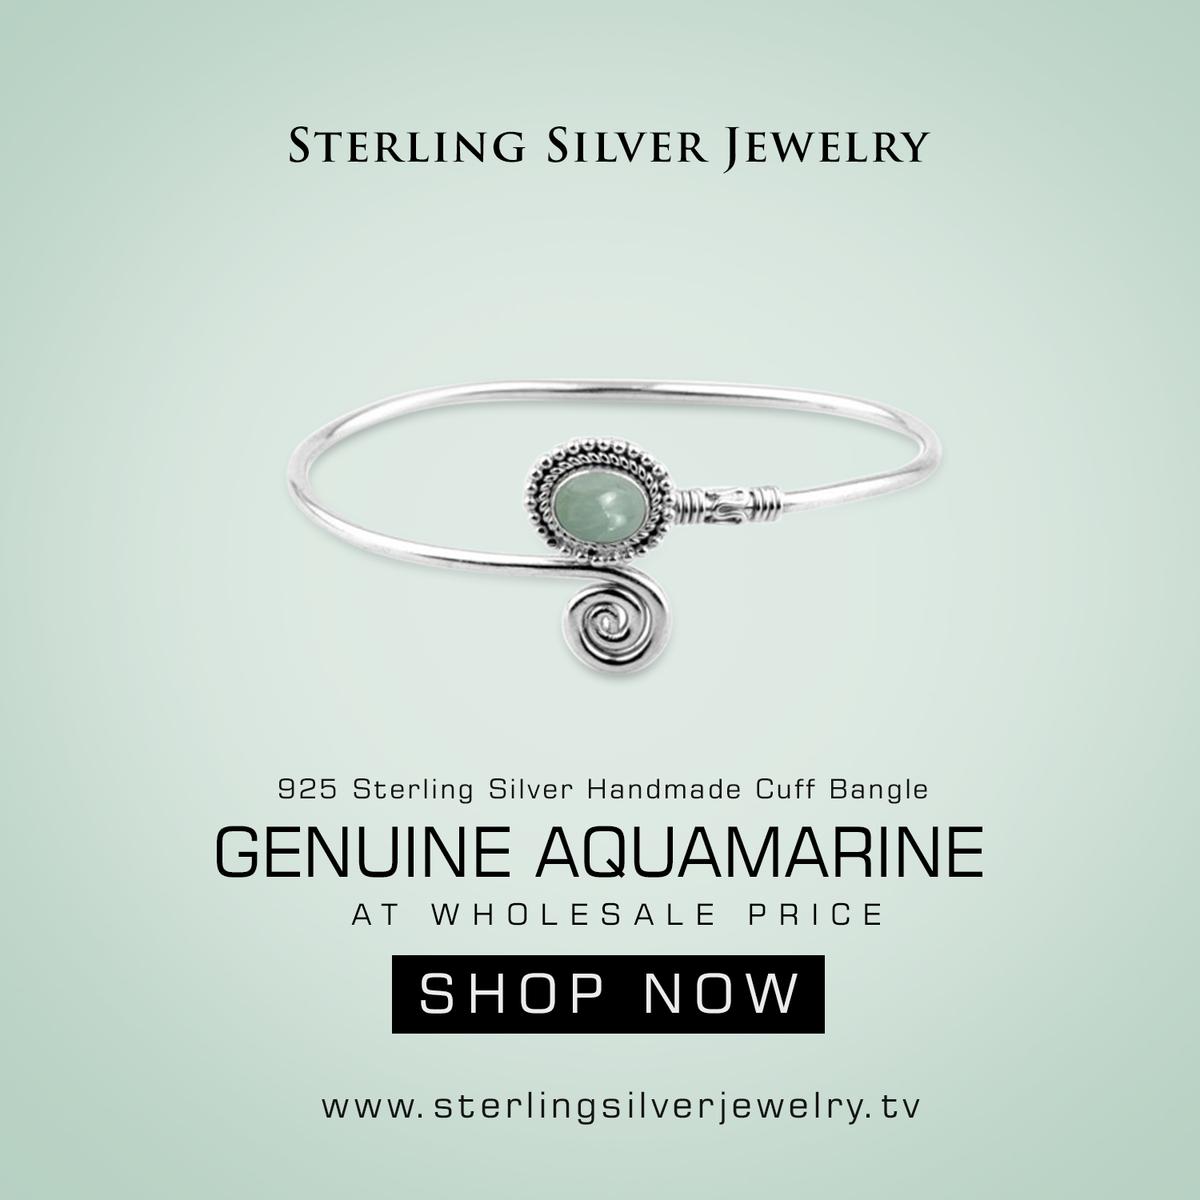 f:id:sterlingsilverjewelry:20190814213435j:plain